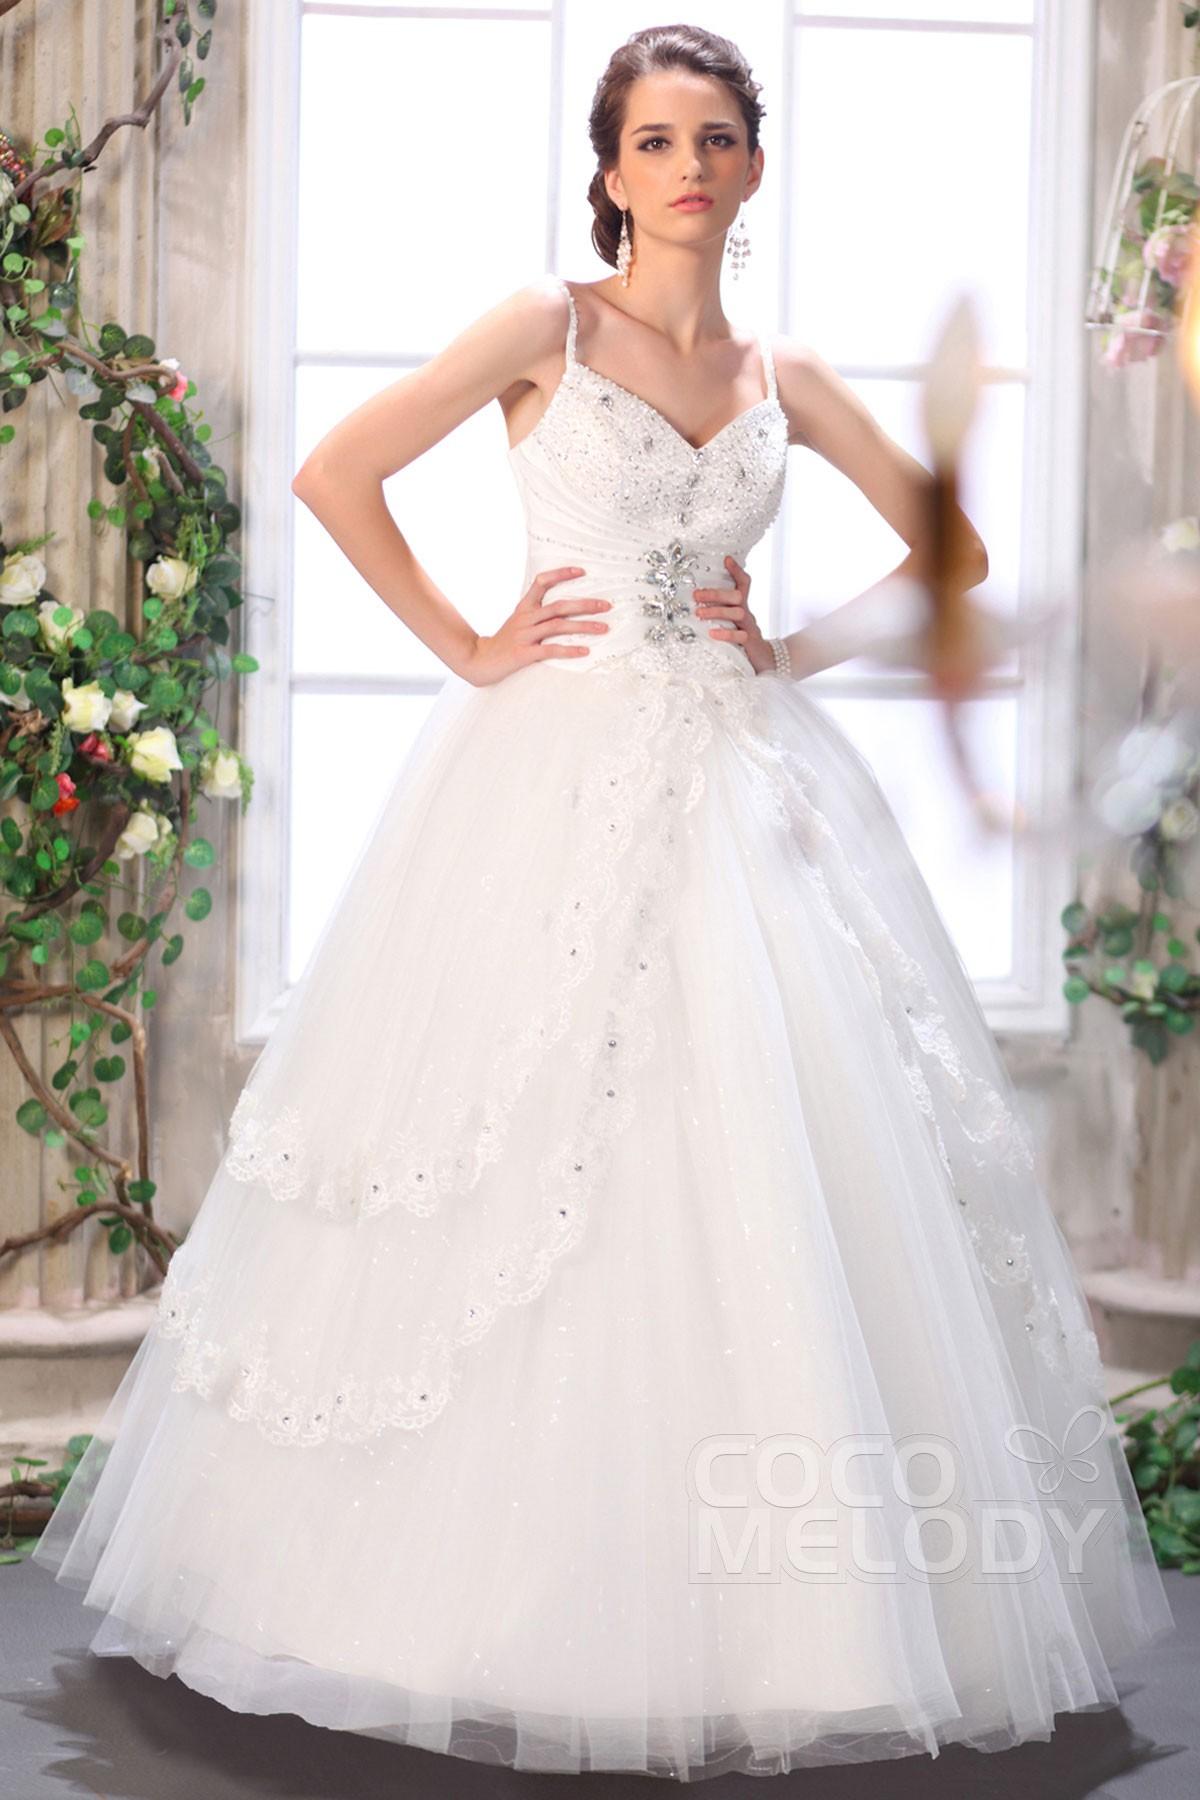 Cocomelody ball gown spaghetti strap floor length tulle for Spaghetti strap ball gown wedding dress